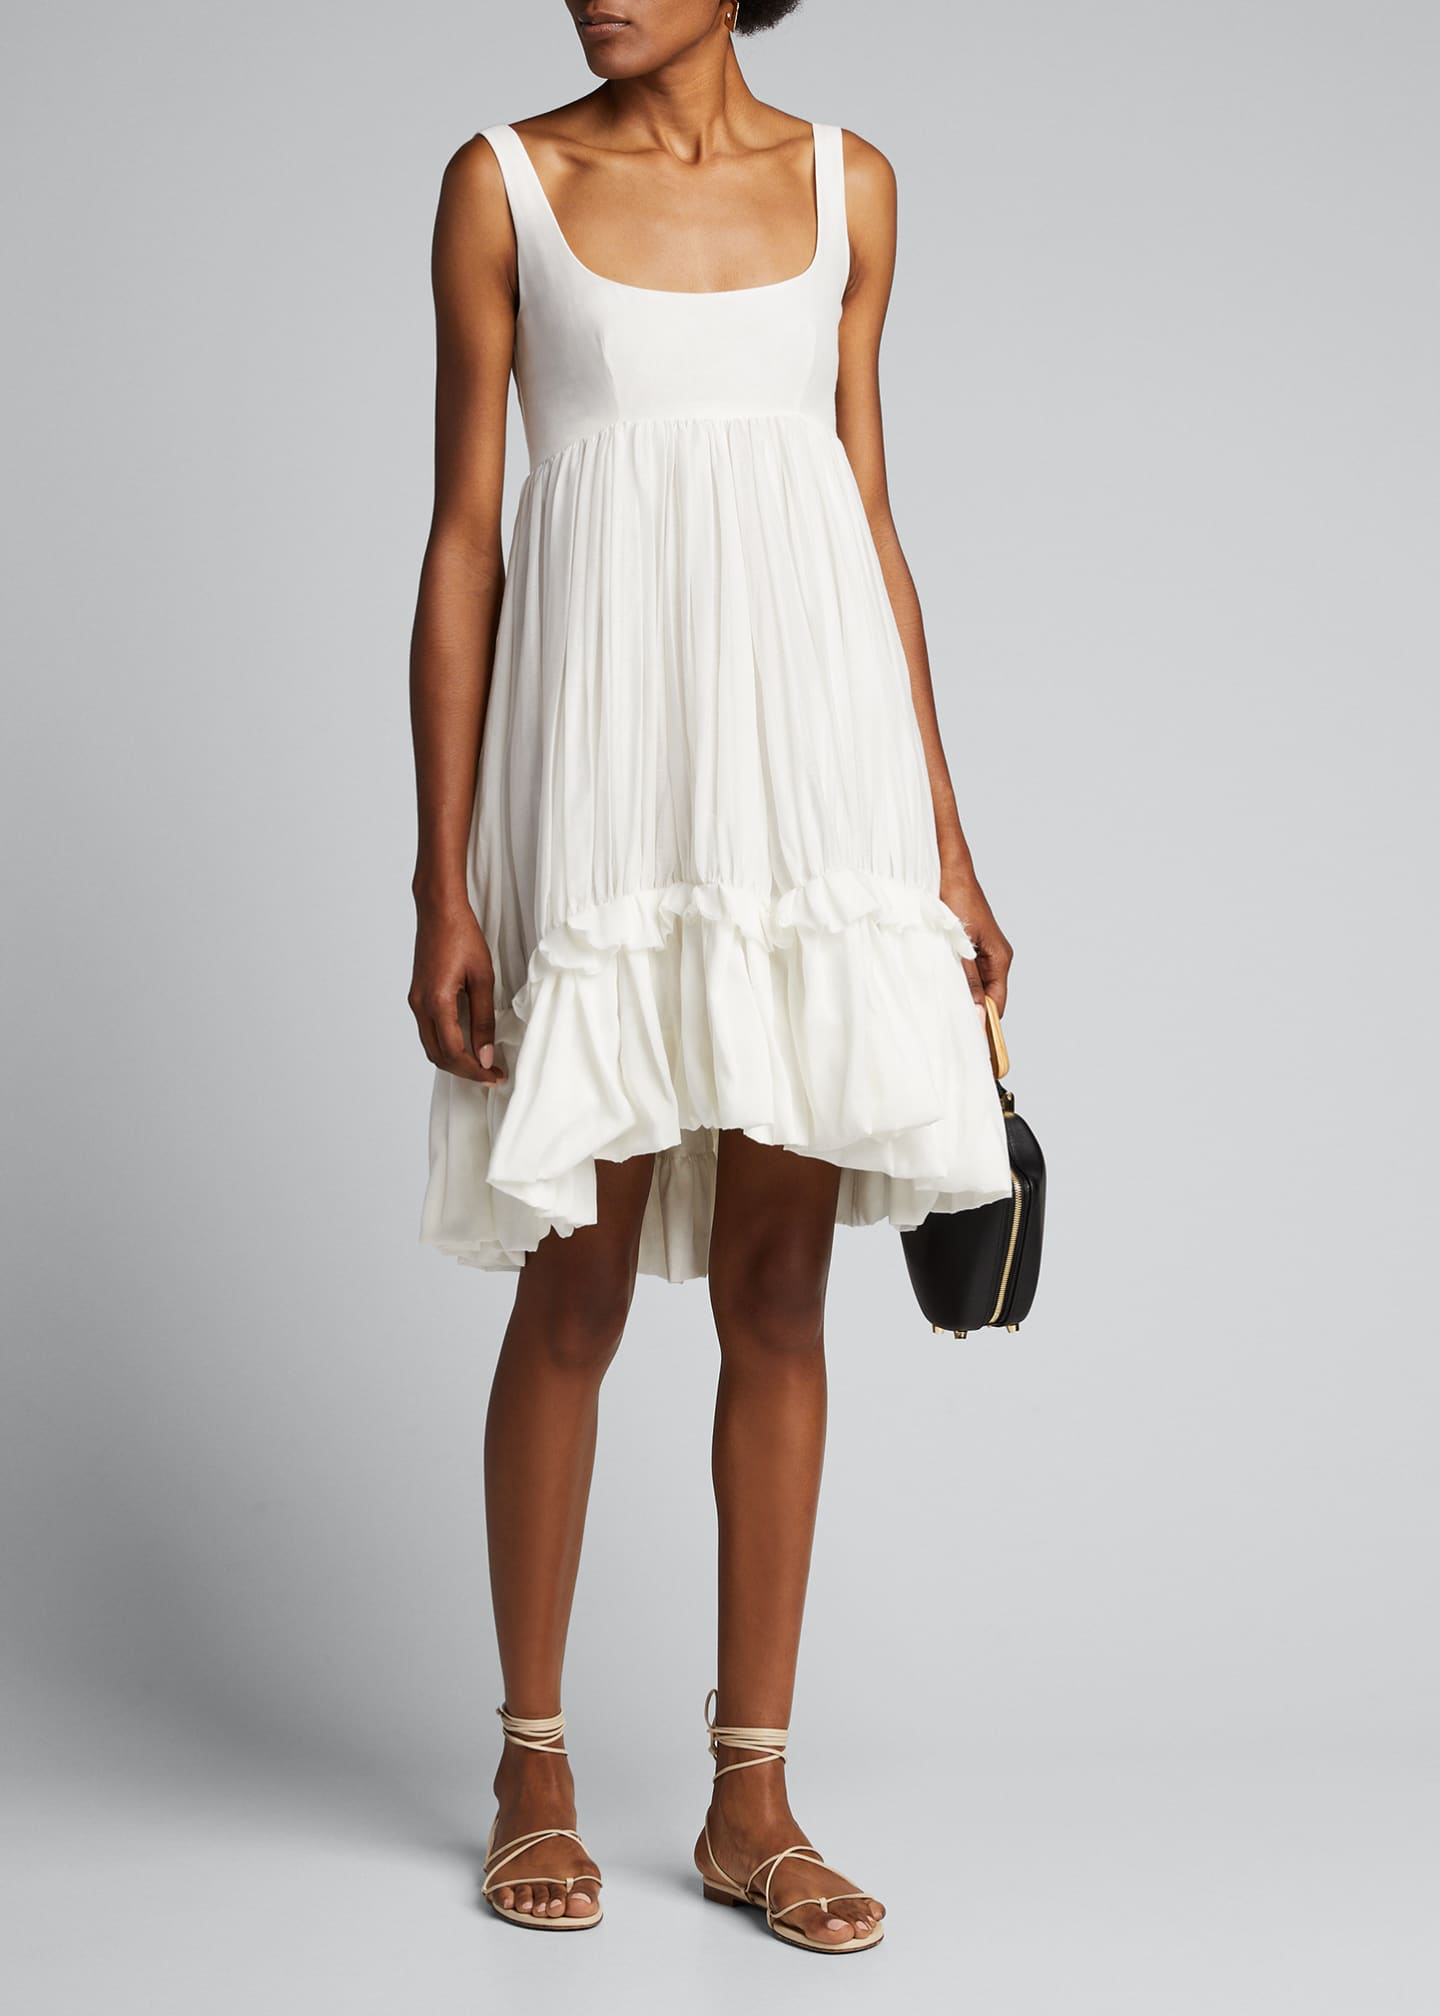 Brock Collection Ruffled Cotton-Silk Scoop-Neck Dress